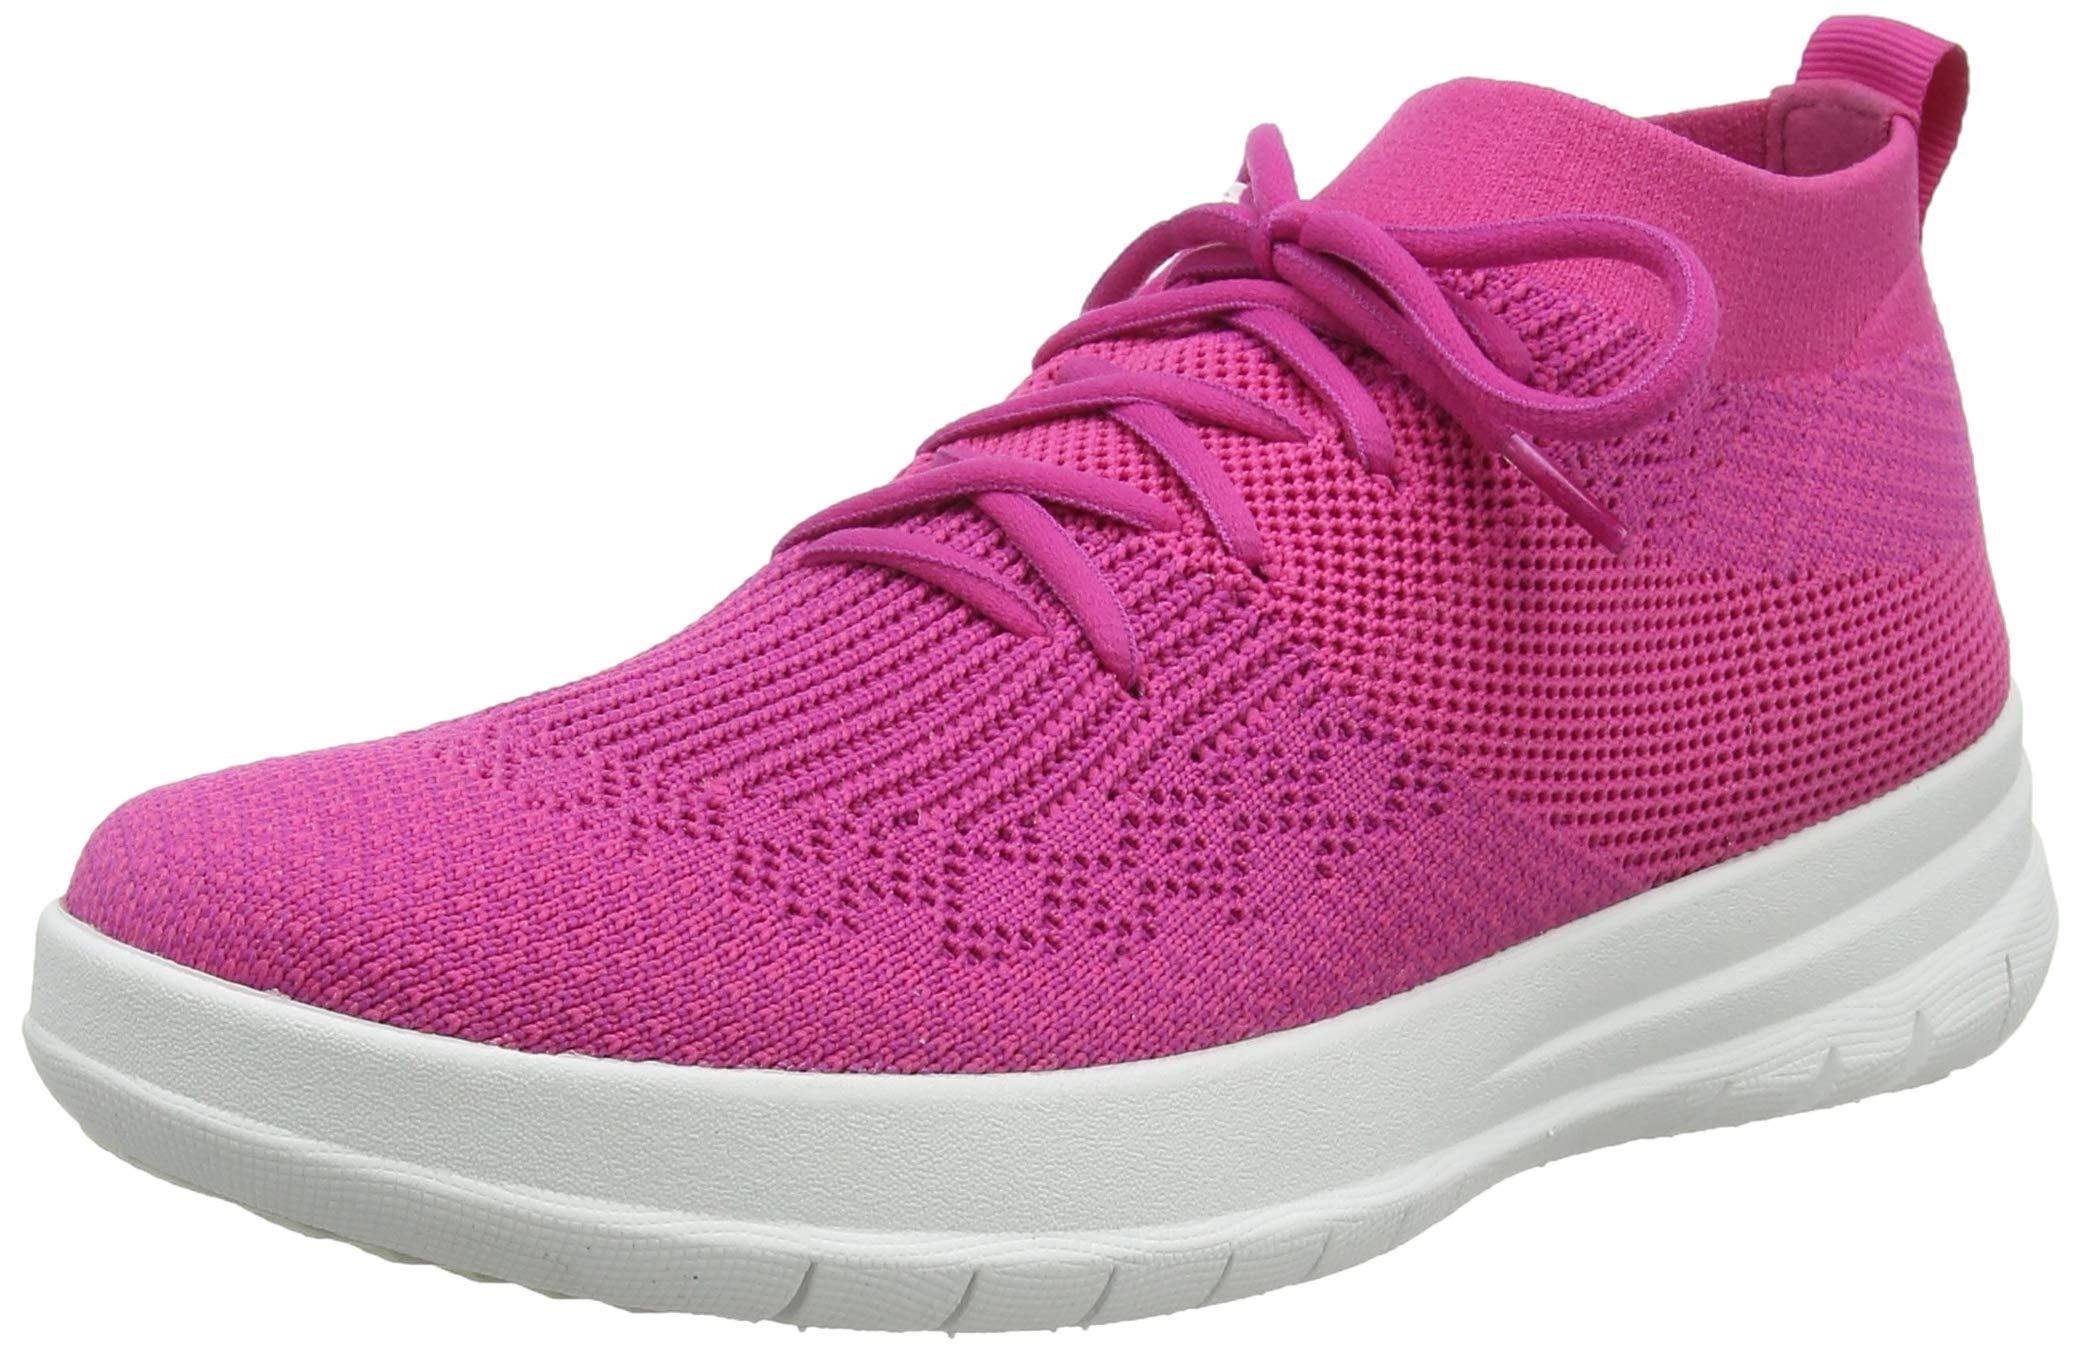 d52eab7d6eb612 Galleon - FitFlop Women s Uberknit Slip-ON HIGH TOP Sneaker Hi Trainers